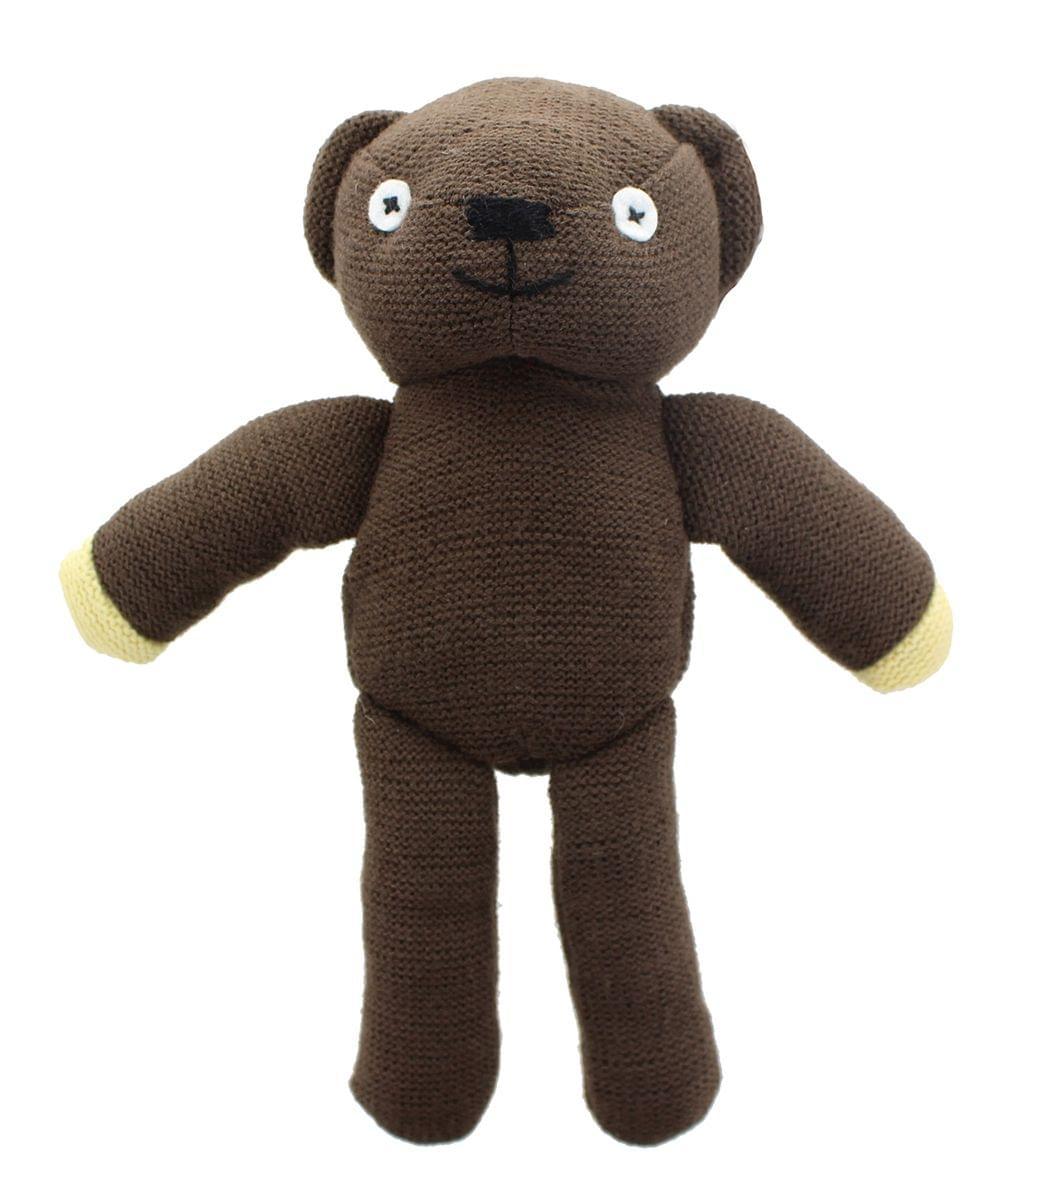 mr bean 10 plush teddy bear 91671962308 ebay. Black Bedroom Furniture Sets. Home Design Ideas